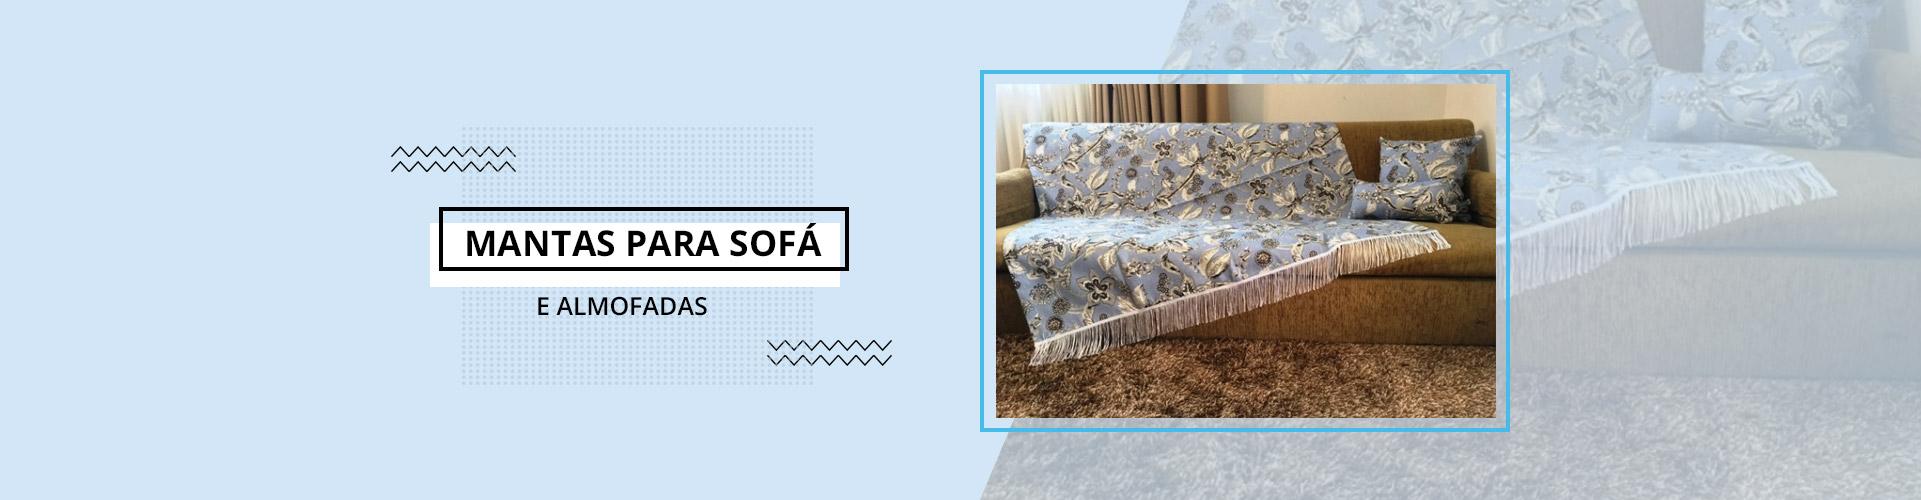 Mantas para Sofá